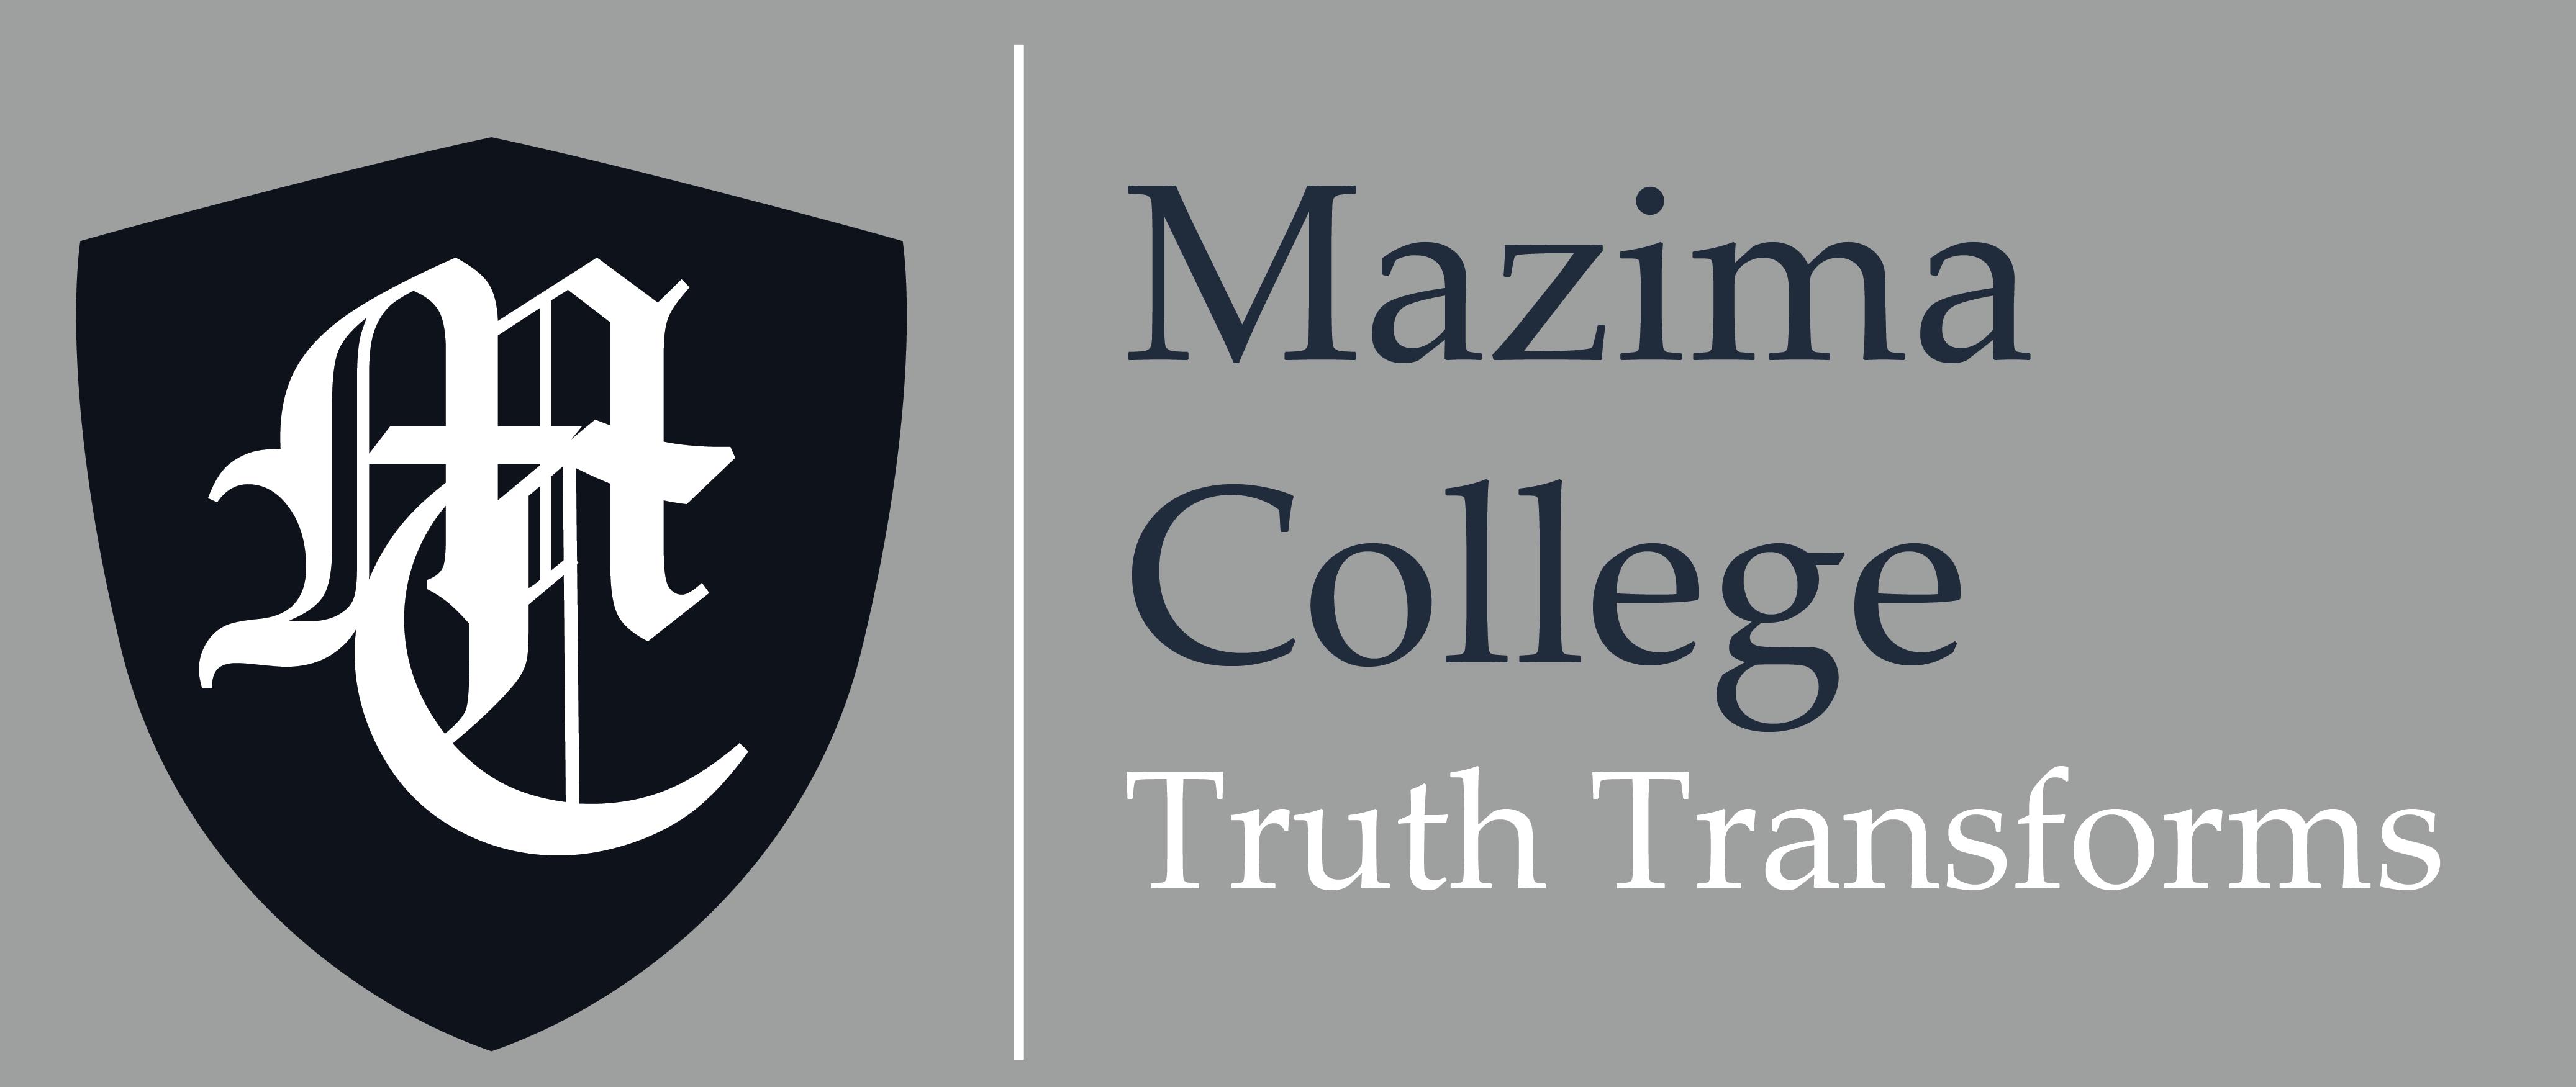 Mazima College